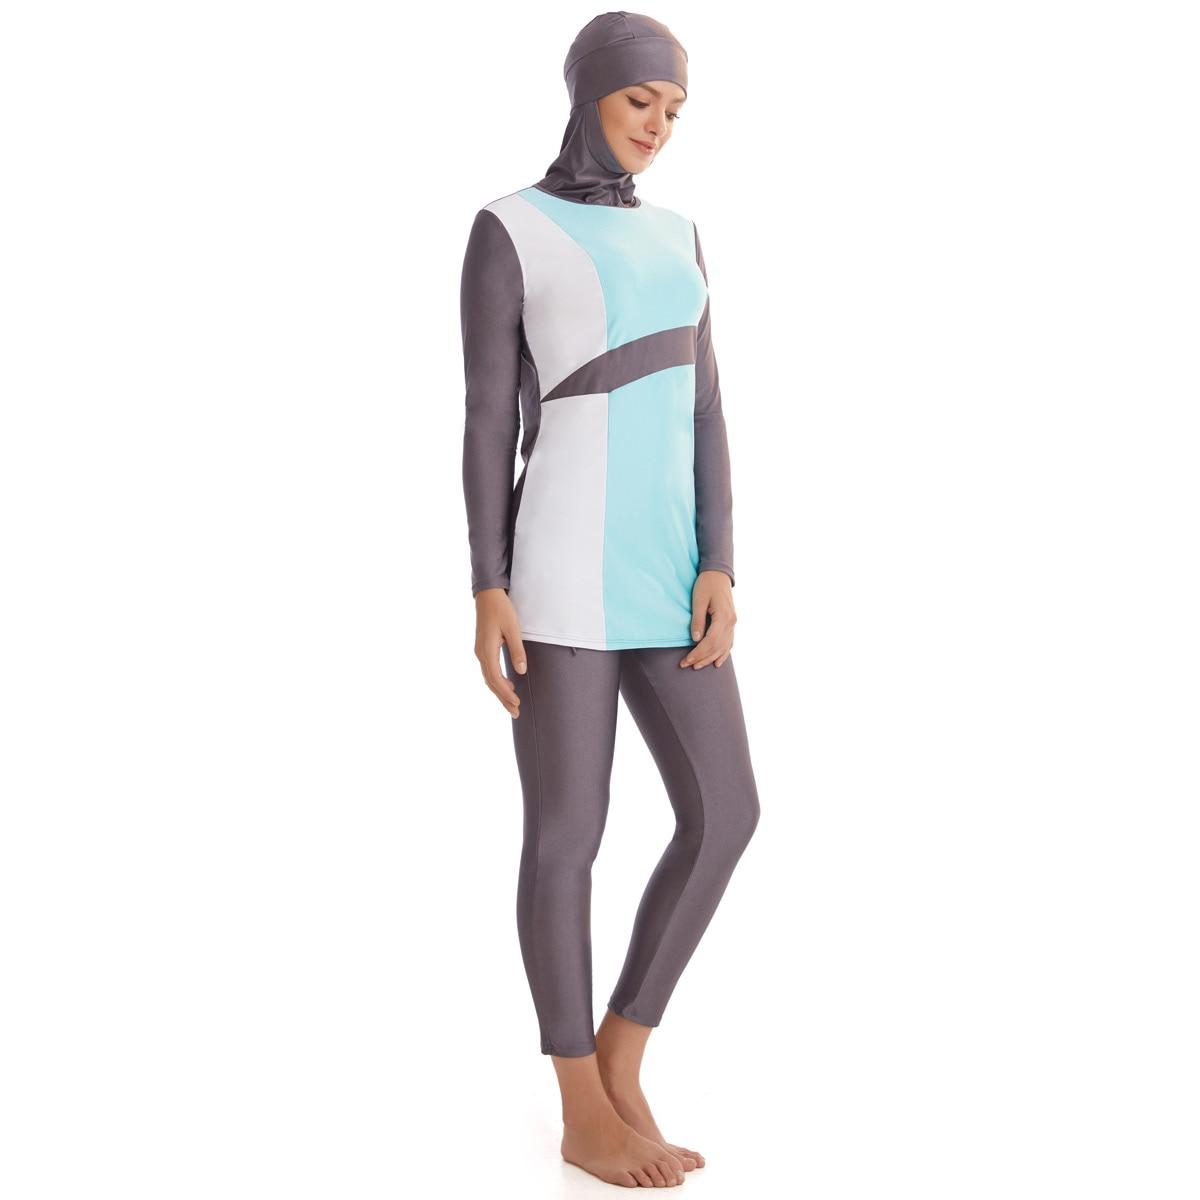 Hijab Swimsuit New Burkini Long Sleeve  Bathing Suit Women Islamic Habit Femme Burkinis Patchwork Color Muslim